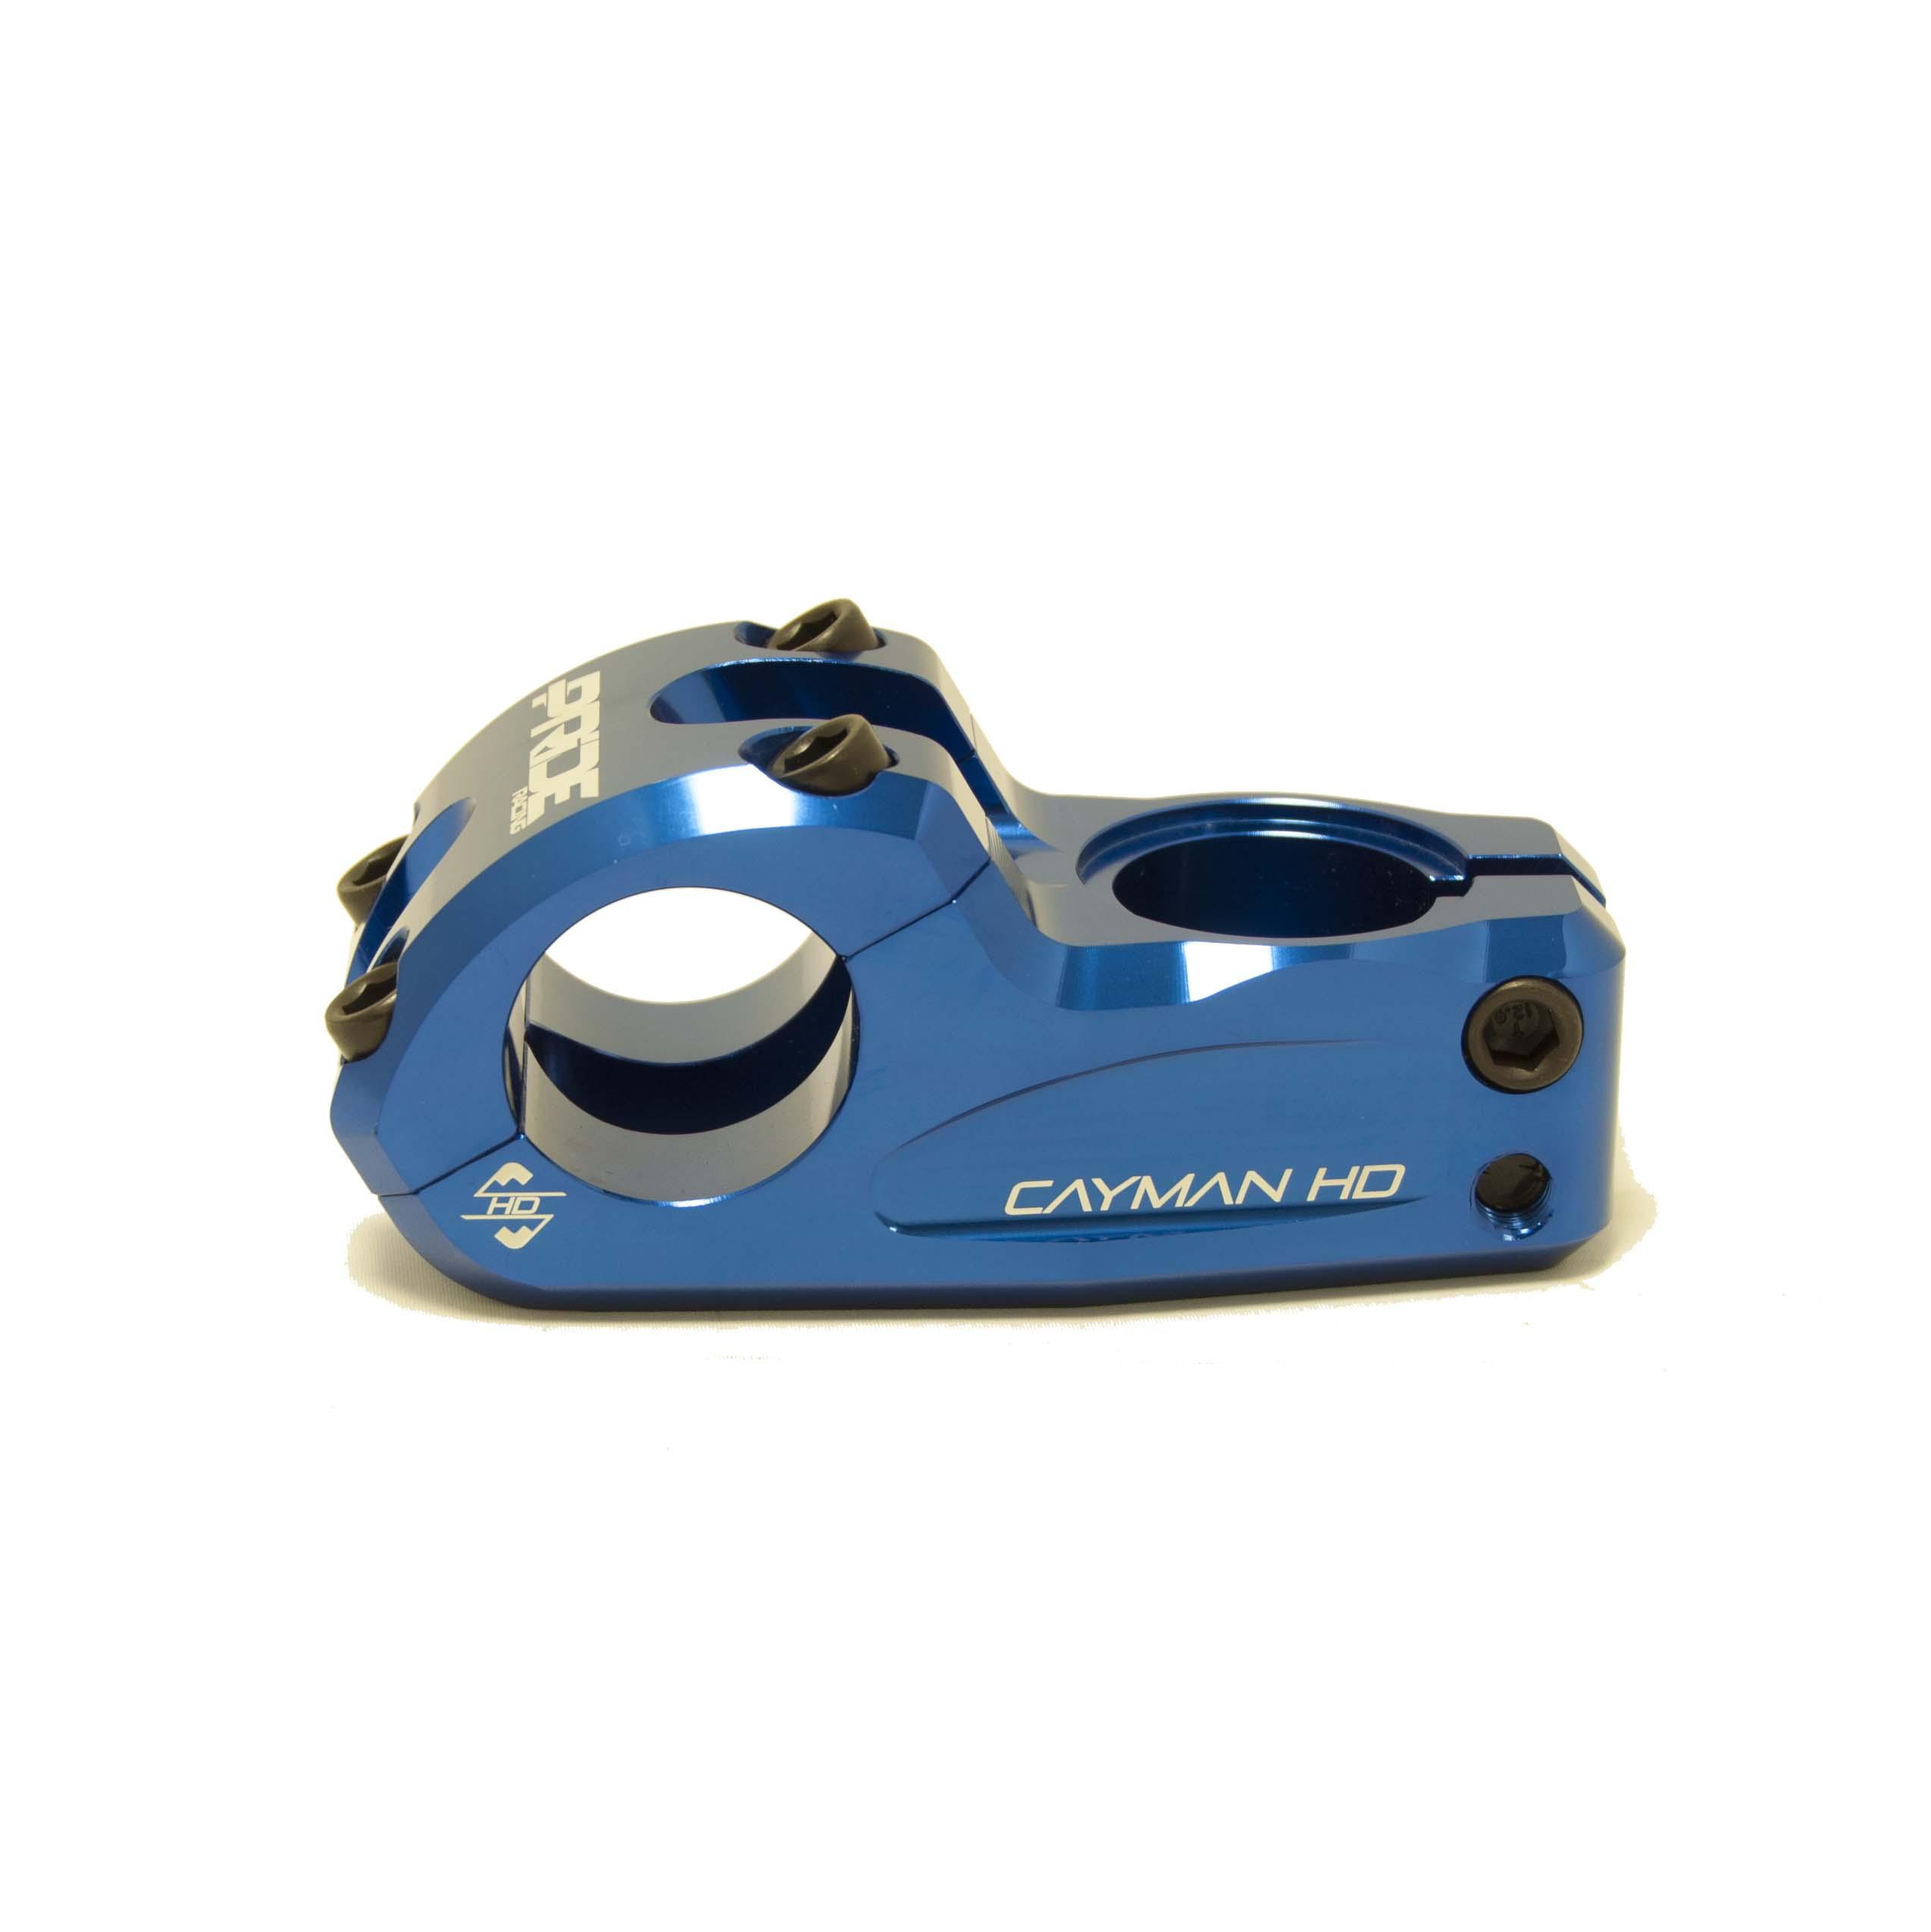 POTENCE PRIDE CAYMAN HD 31.8 BLUE